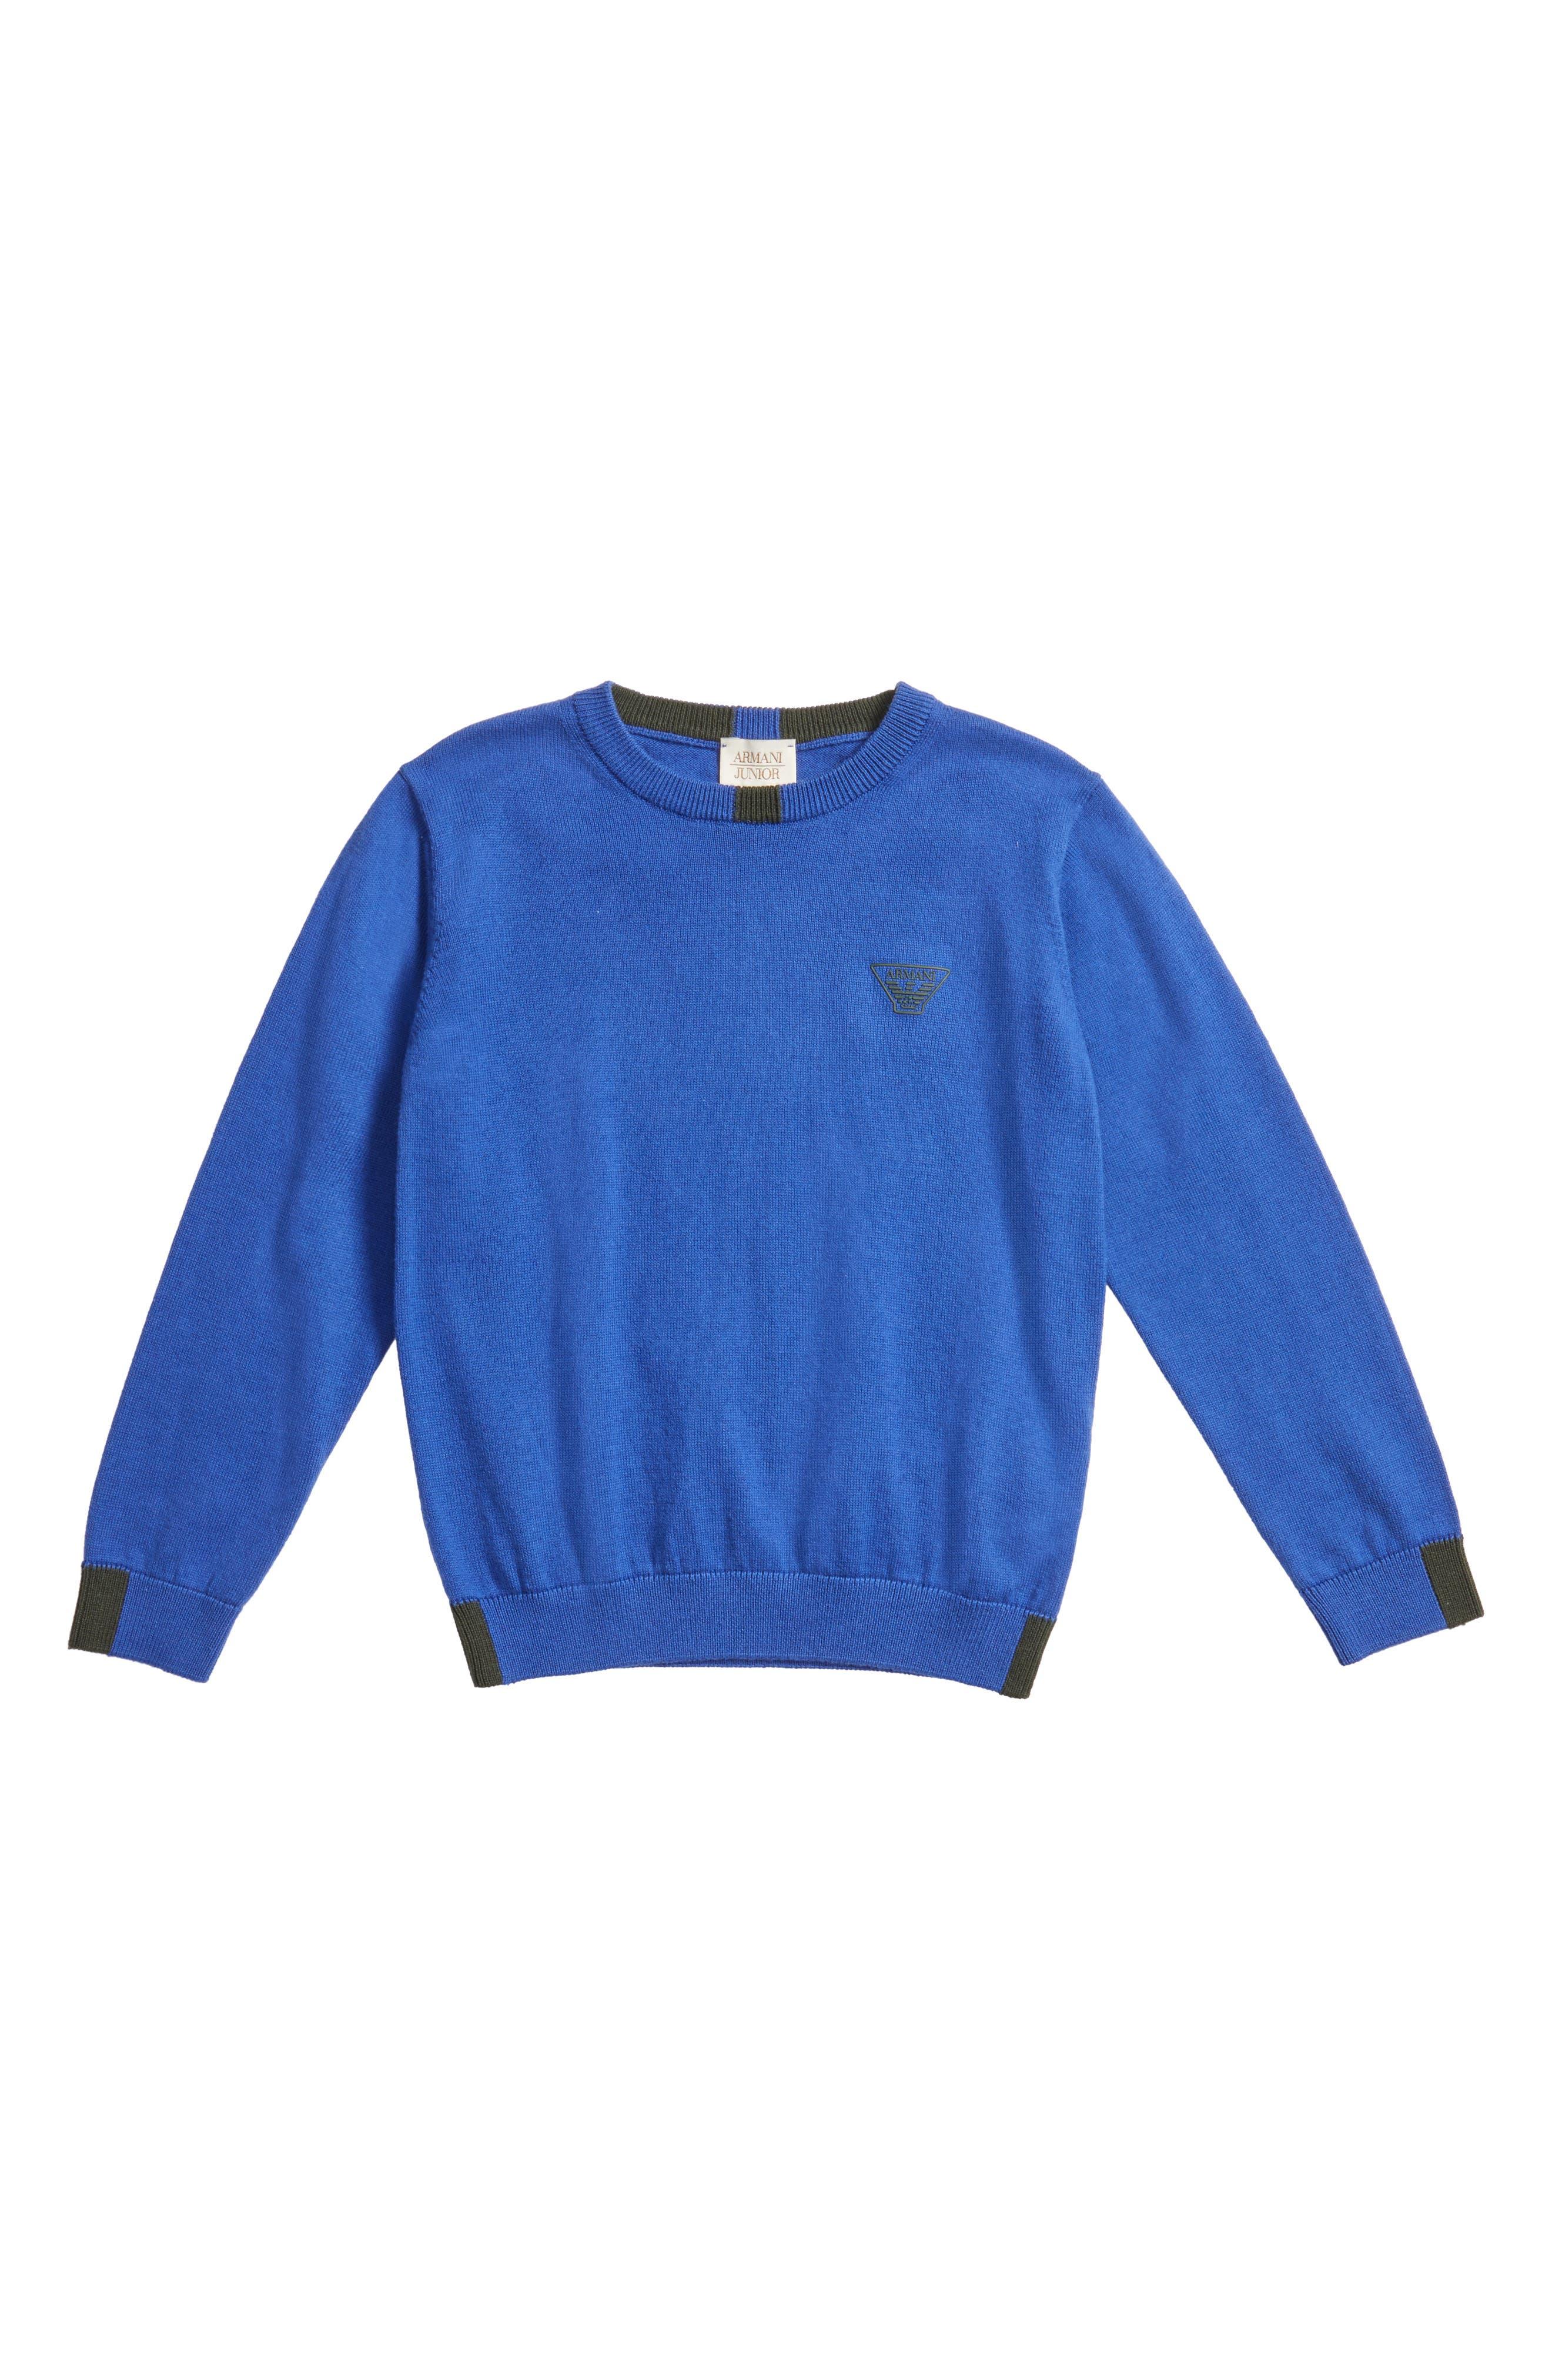 Alternate Image 1 Selected - Armani Junior Sweater (Little Boys & Big Boys)